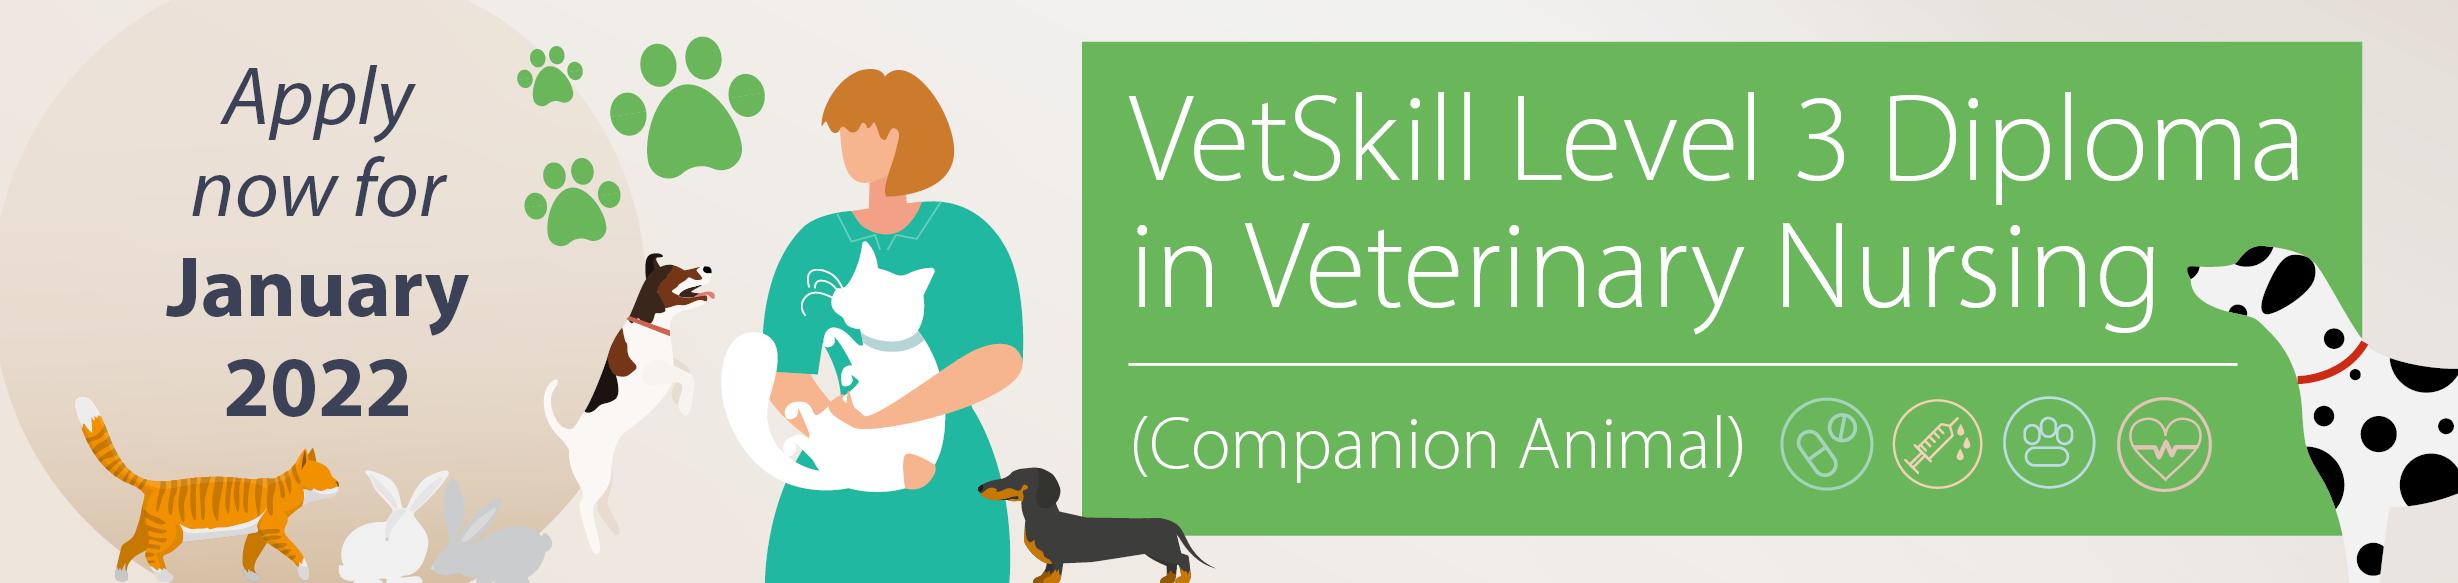 Start studying the Level 3 Diploma in Veterinary Nursing in January 2022